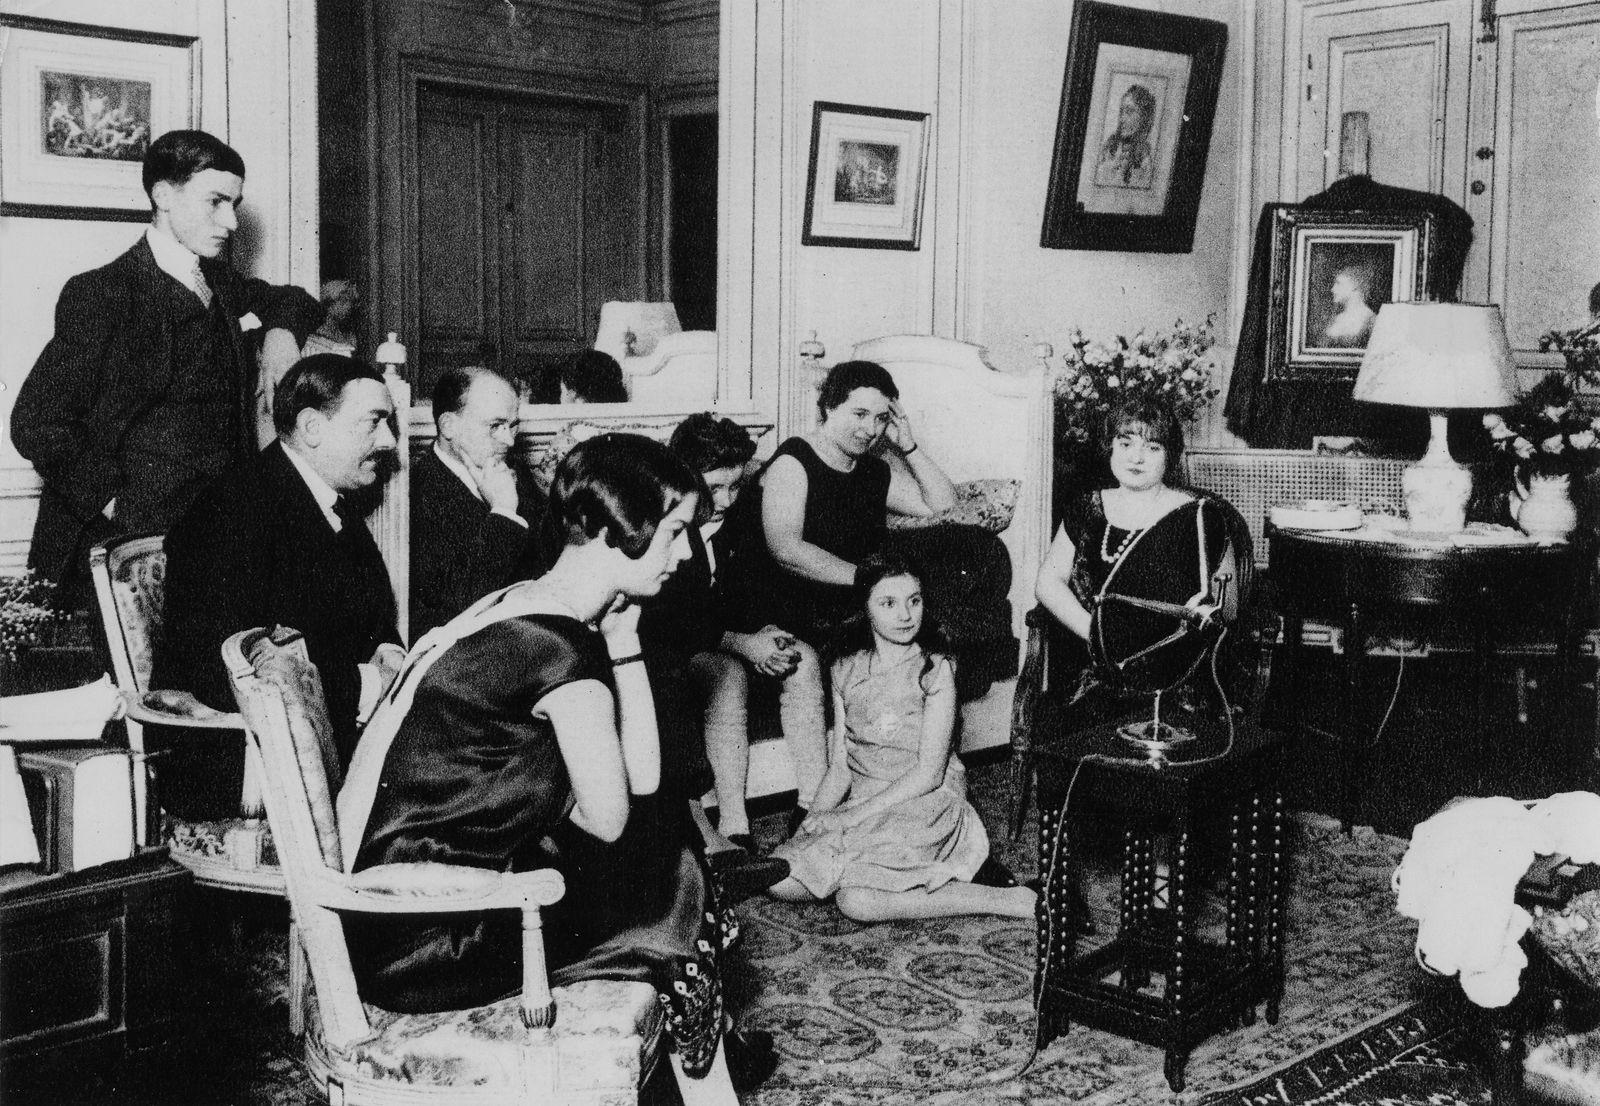 Family listening to the radio